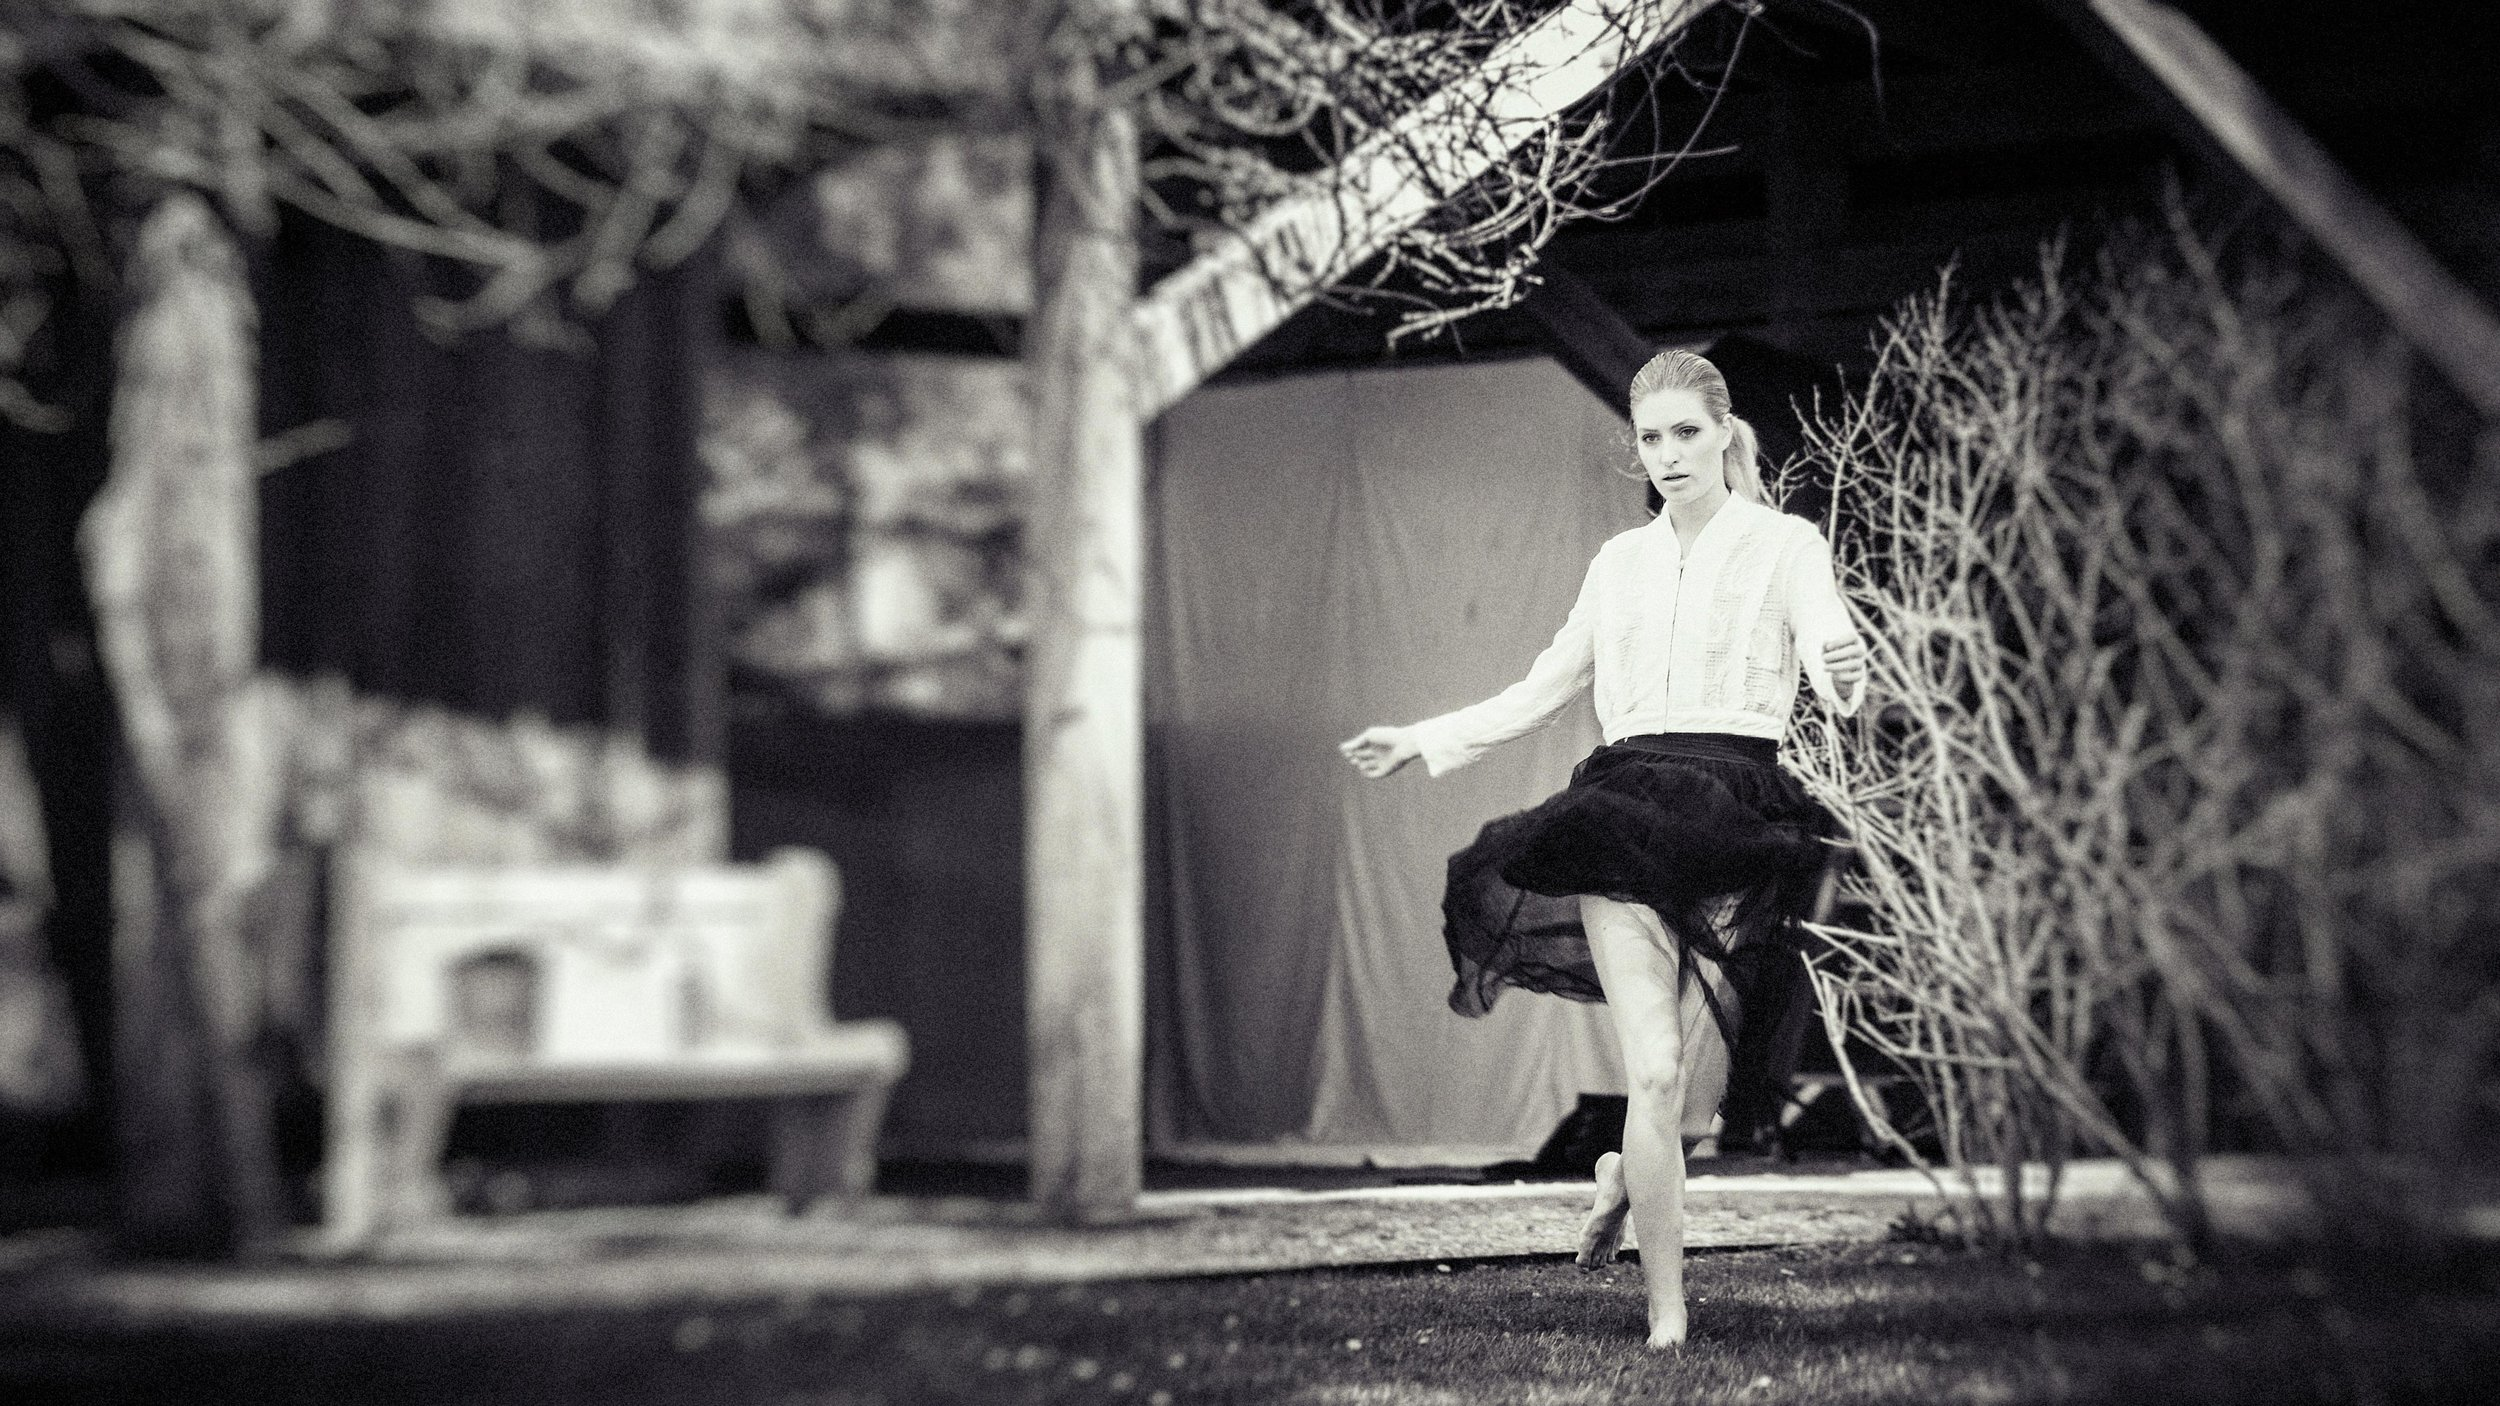 Annie - Model test shoot,Cape Cod, MA